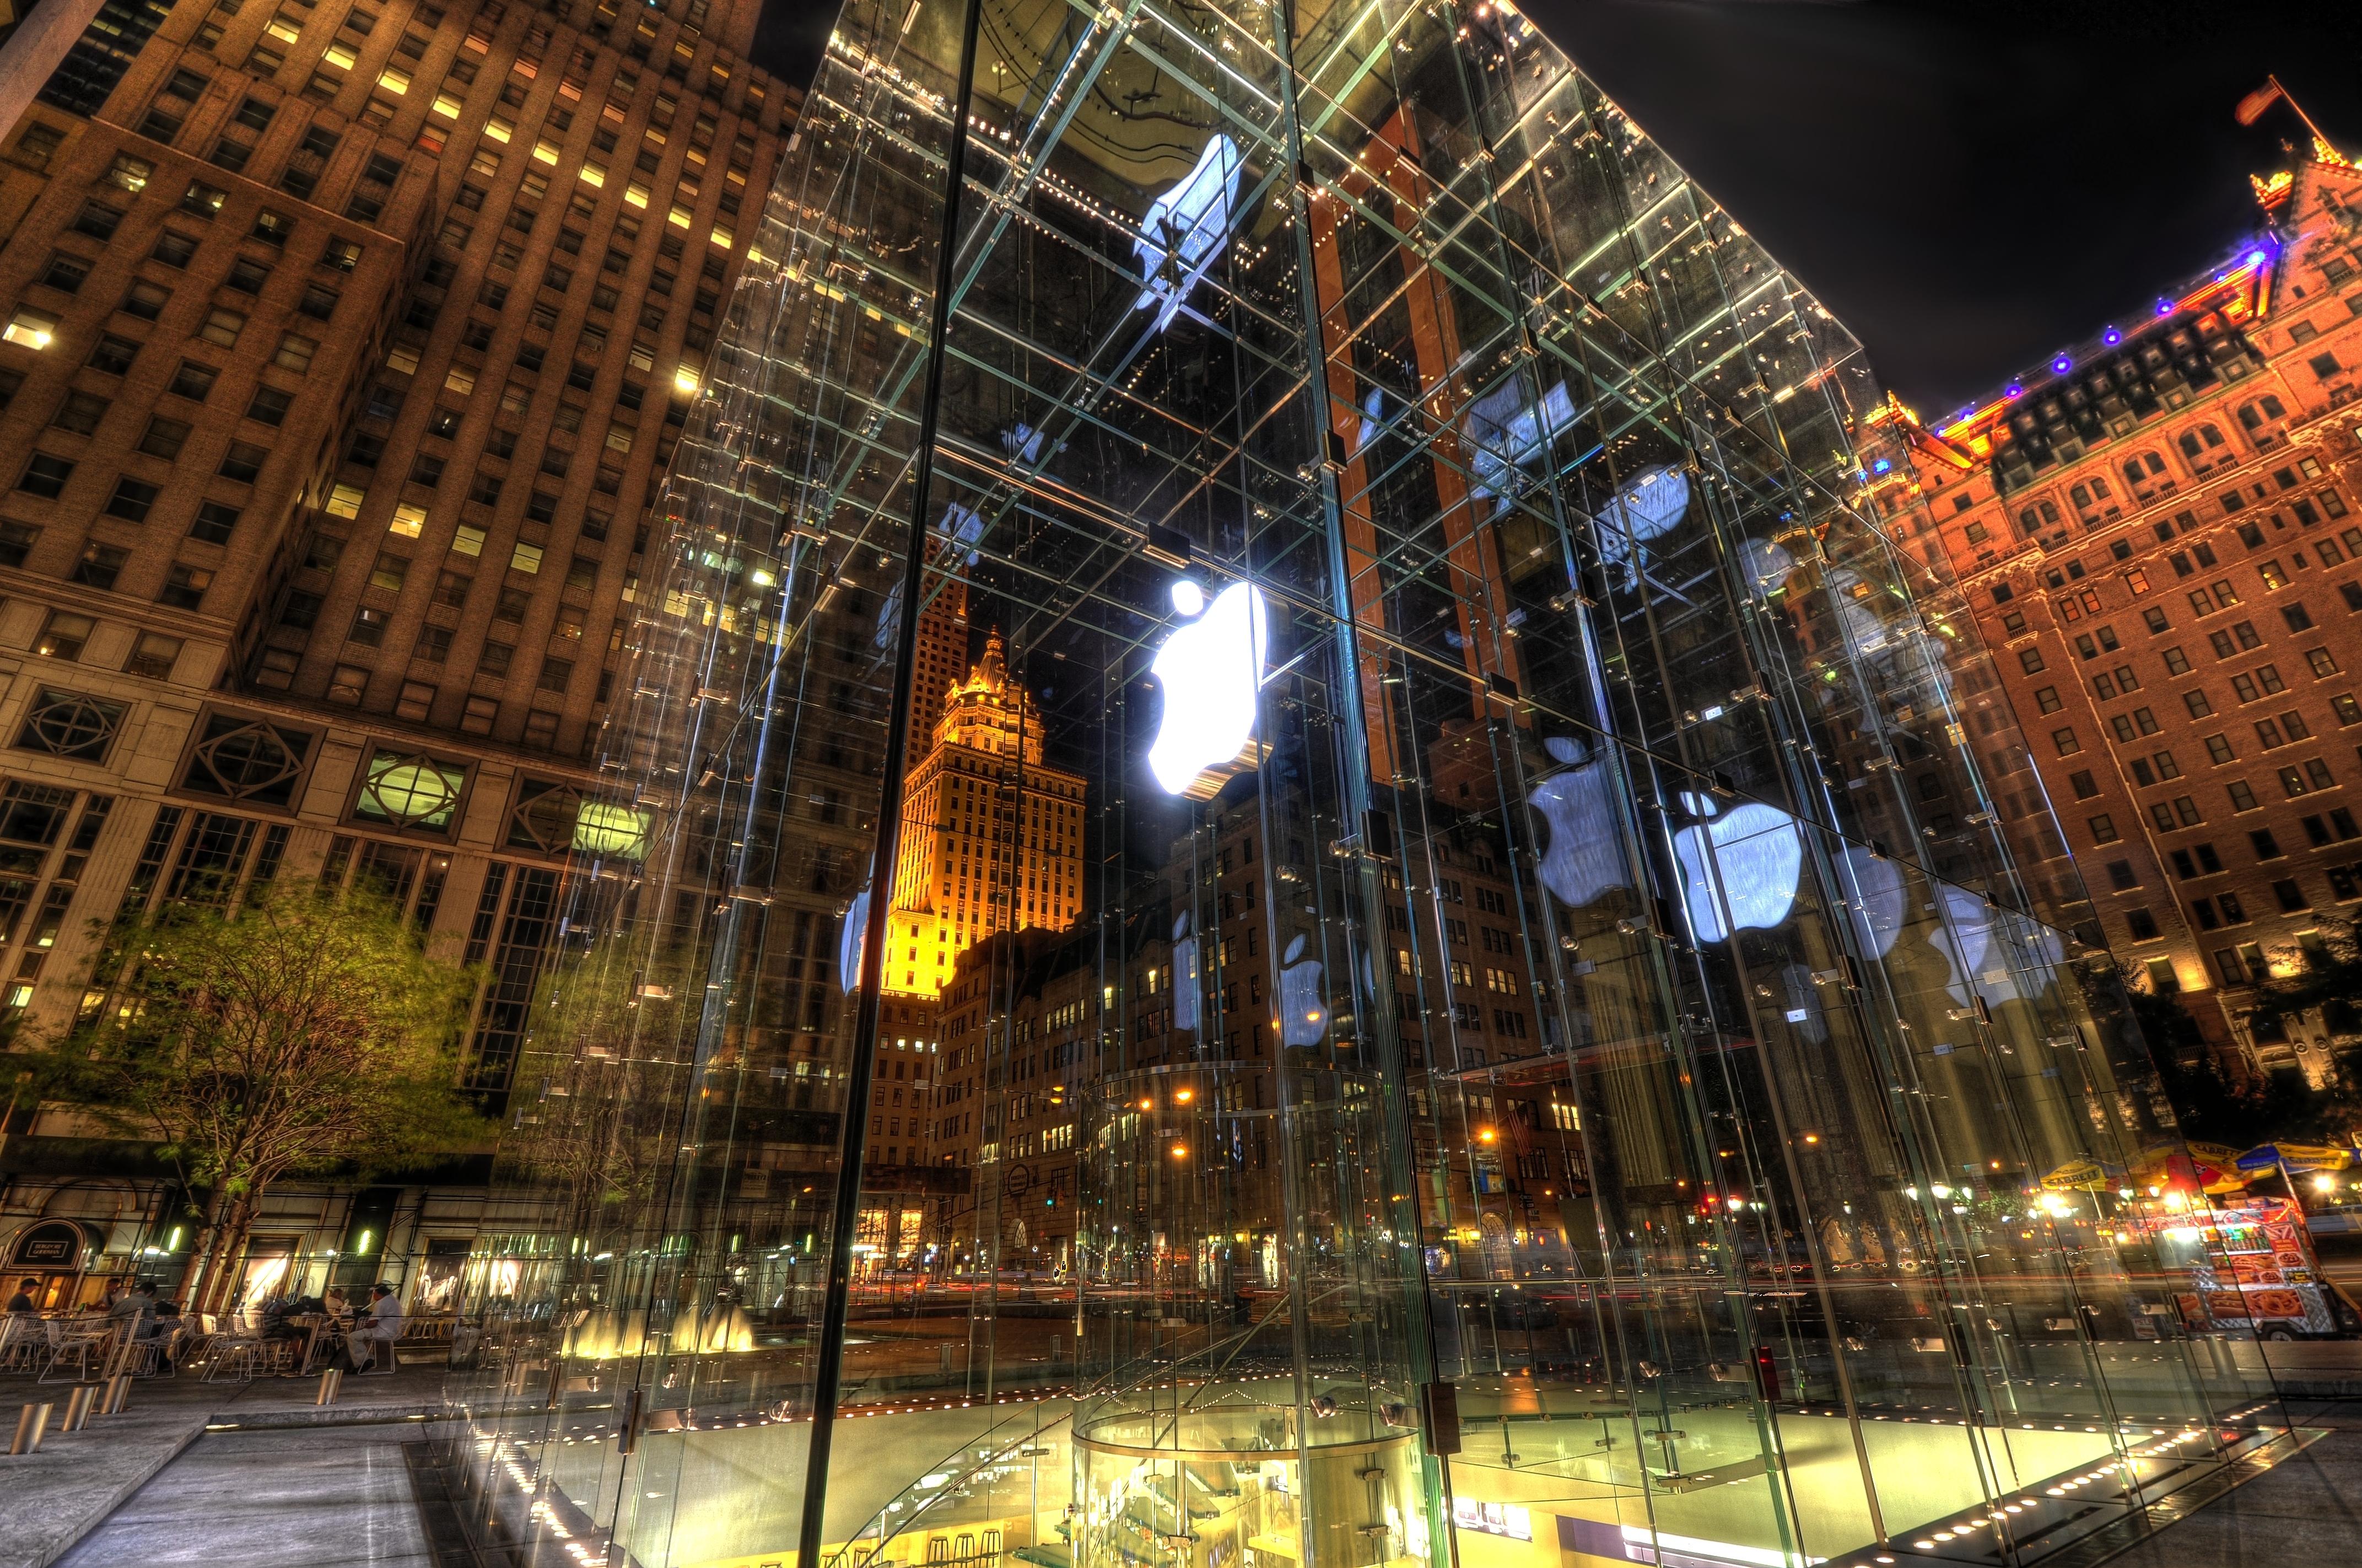 Apple Store: Light, Night, City, Technology, Building, HDR, Apple Inc., New York, Store